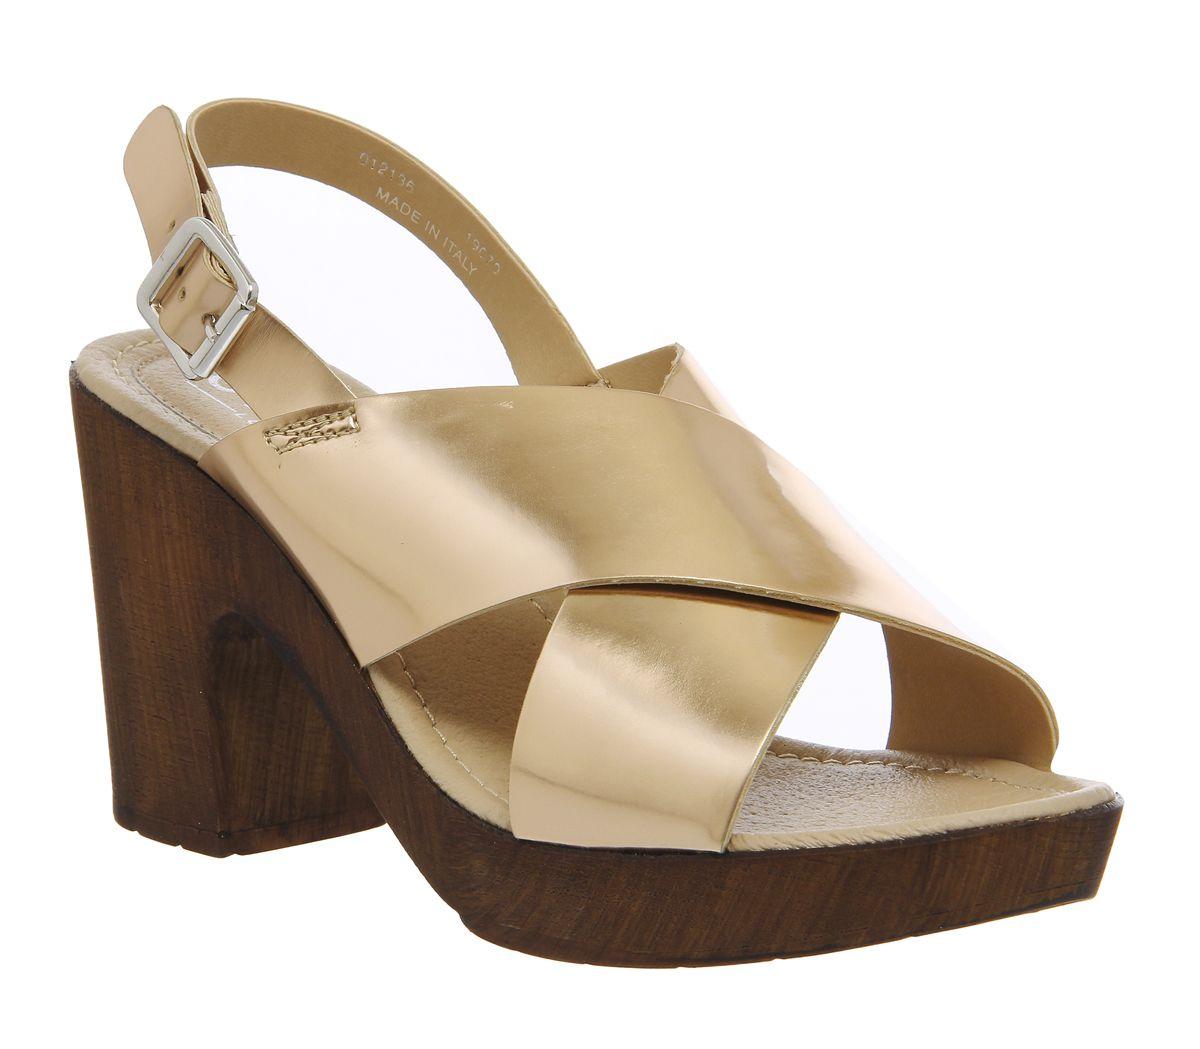 bd2b4b488 Office Wolf Cross Strap Sandals Rose Gold - Sandals